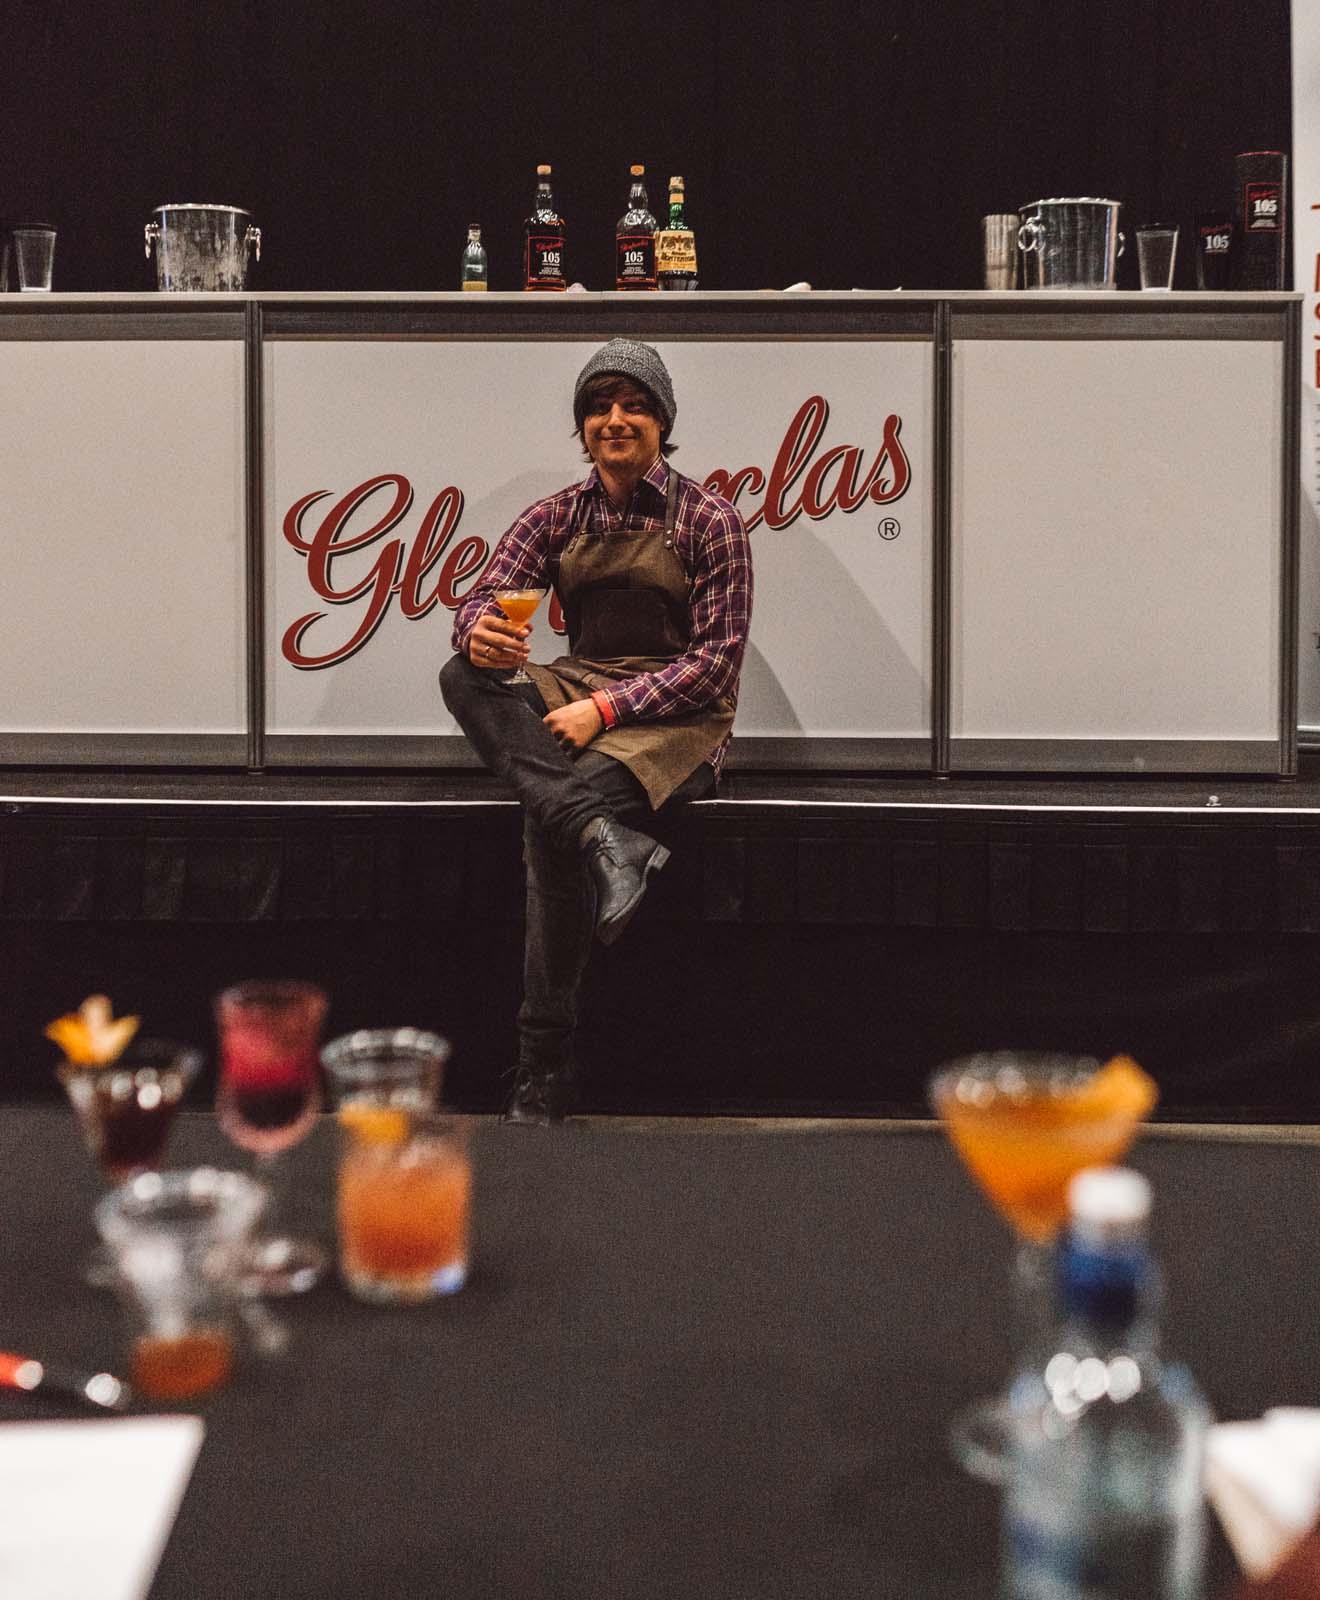 Dramfest 2018 for Whisky Galore-382.jpg